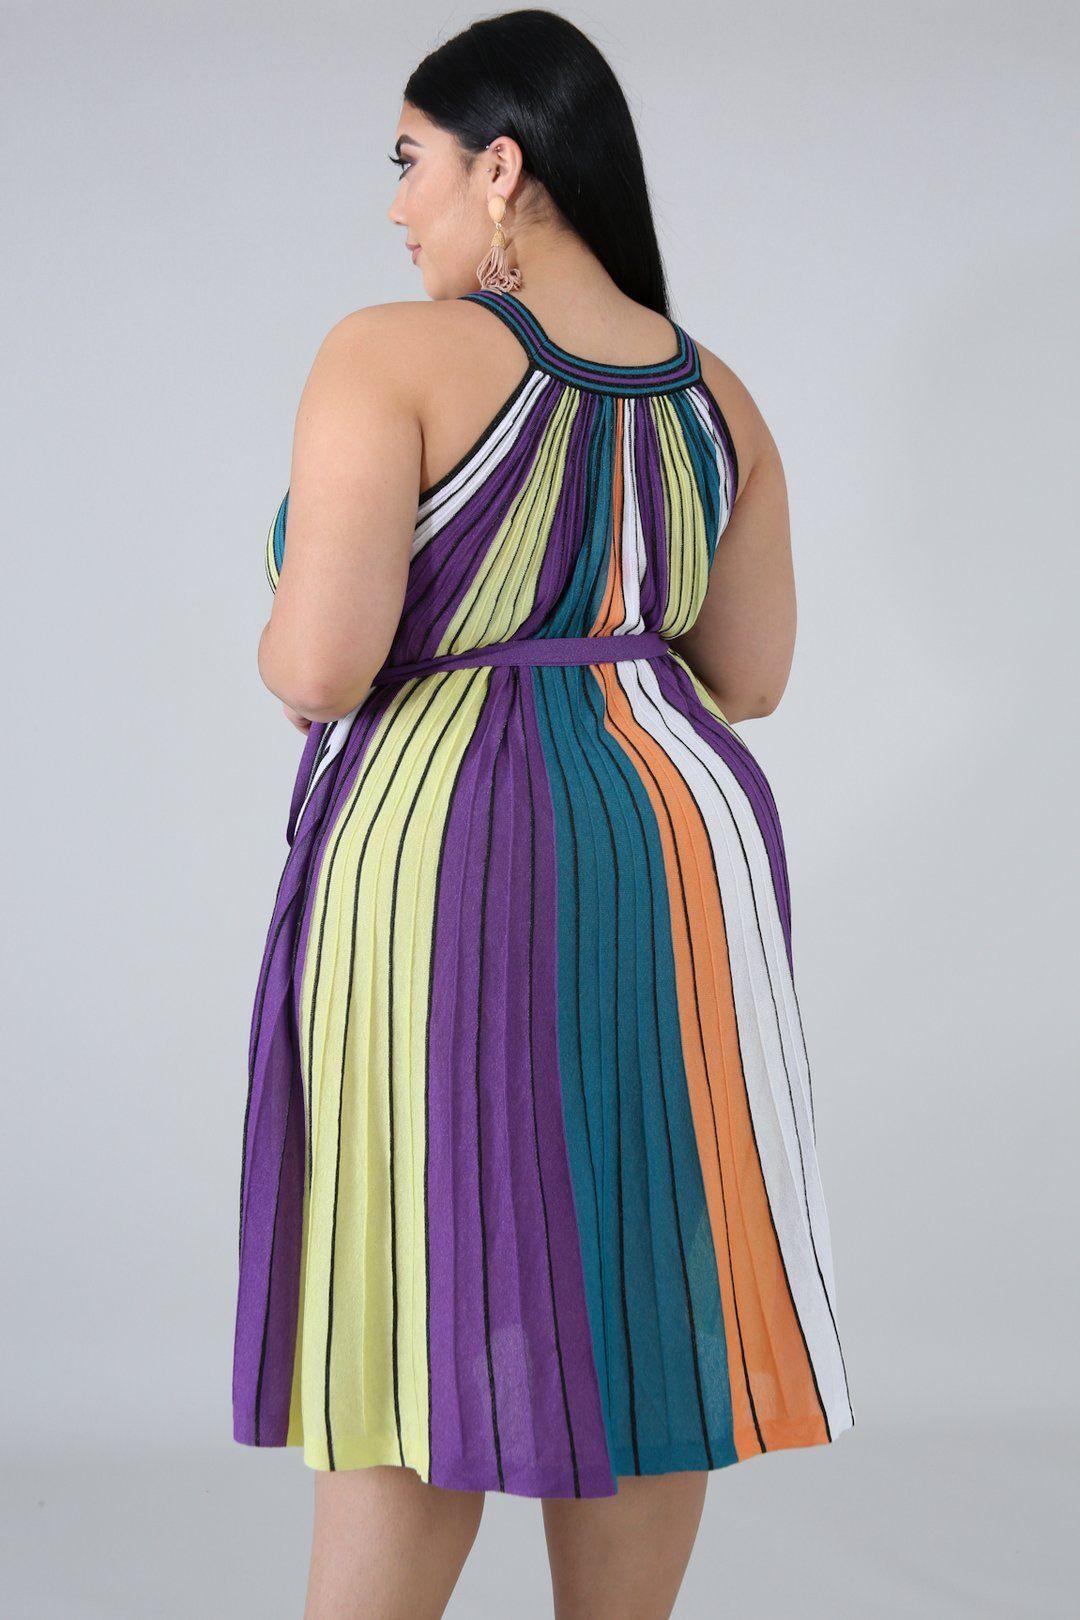 Metallic Stripe Maxi Dress Style 50743 Xdescriptionthis Rainbow Pleated Maxi Dress Features A Stretchy Fabr Plus Dresses Big Size Dress Striped Maxi Dresses [ 1620 x 1080 Pixel ]